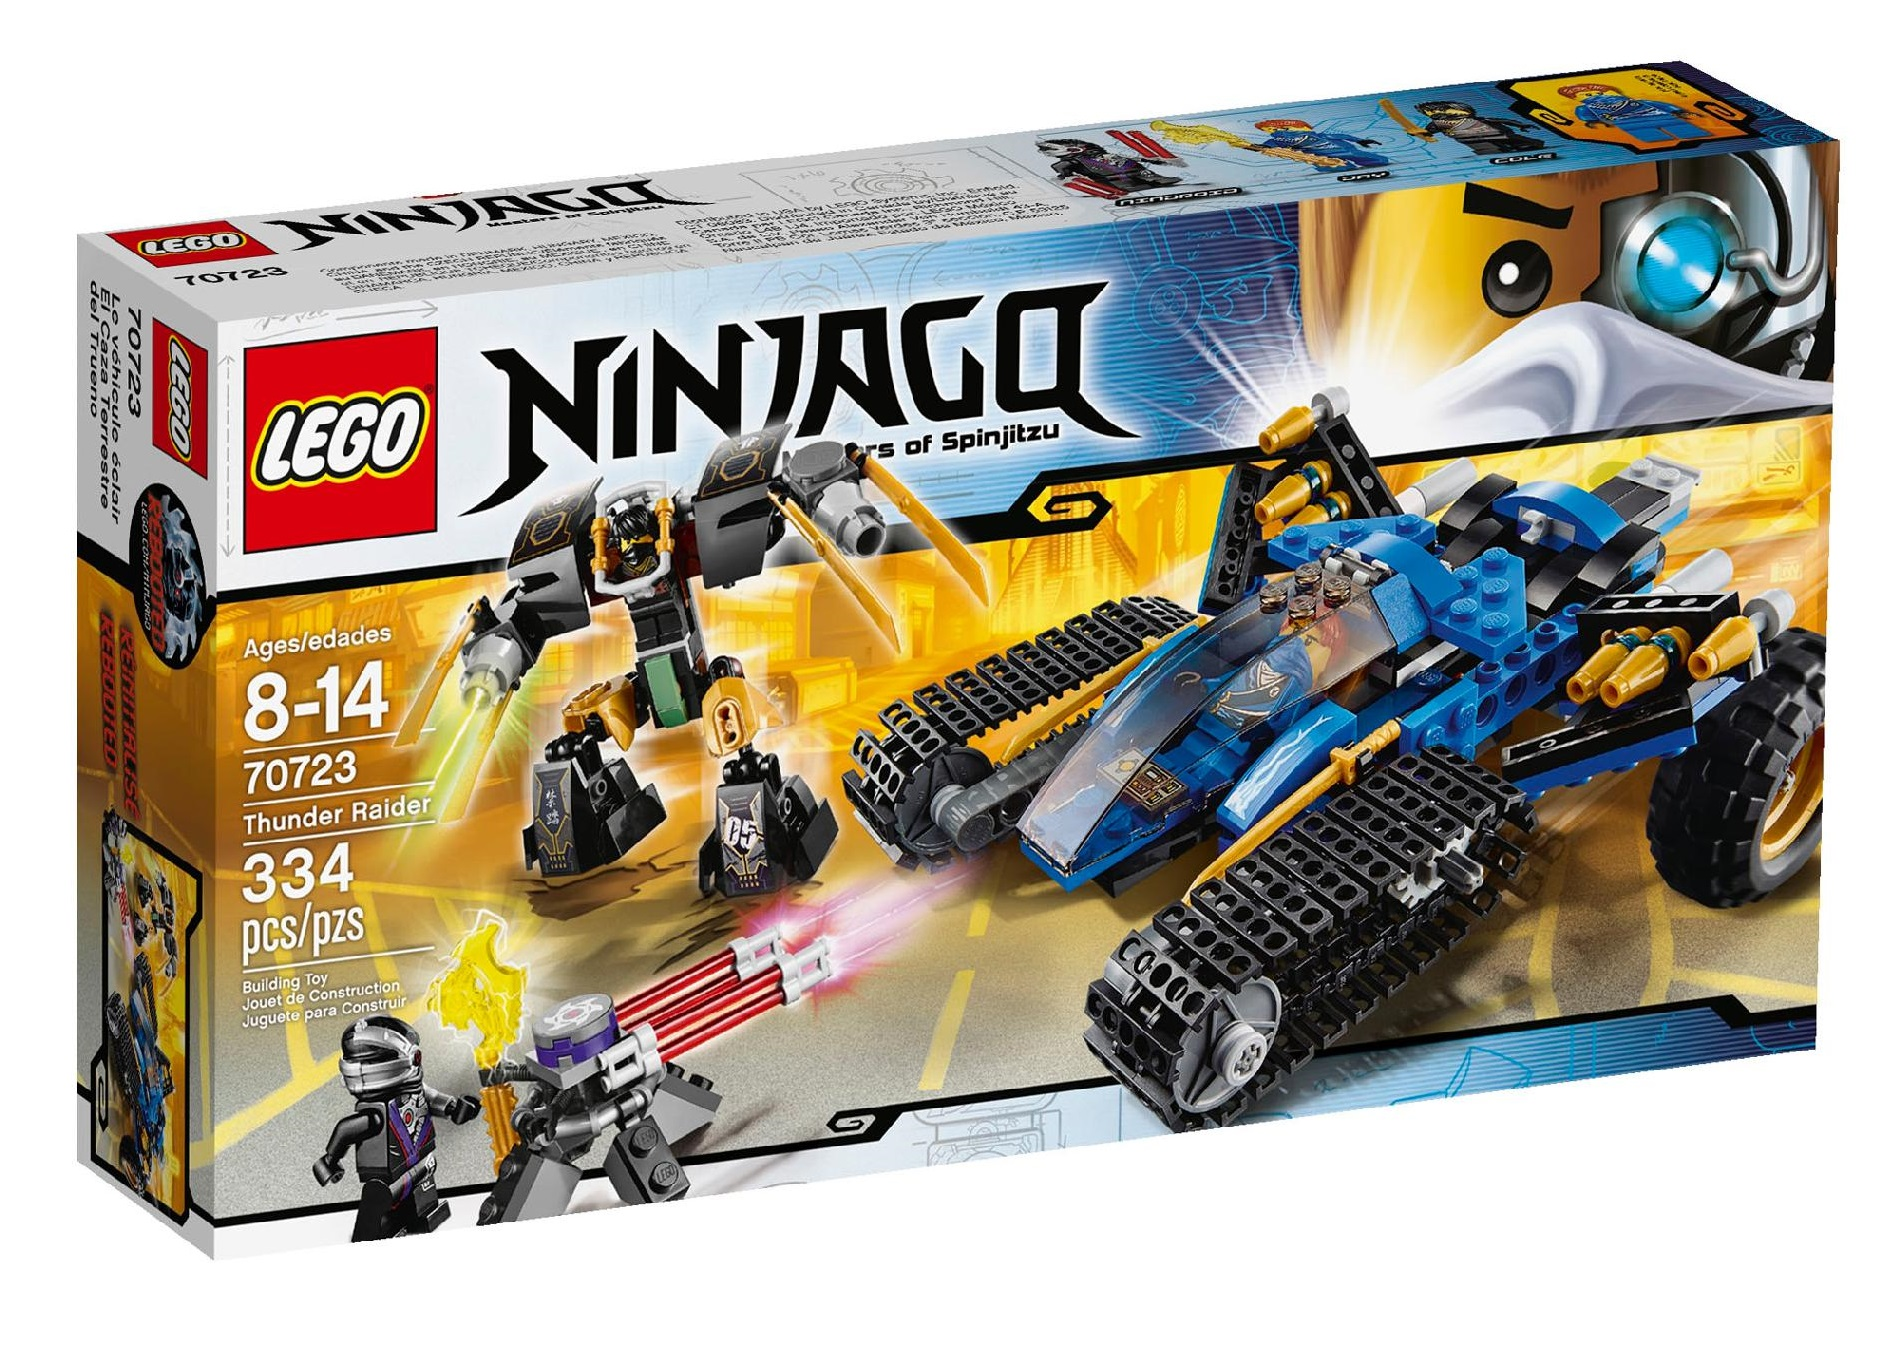 LEGO-70723-Ninjago-Thunder-Raider-4